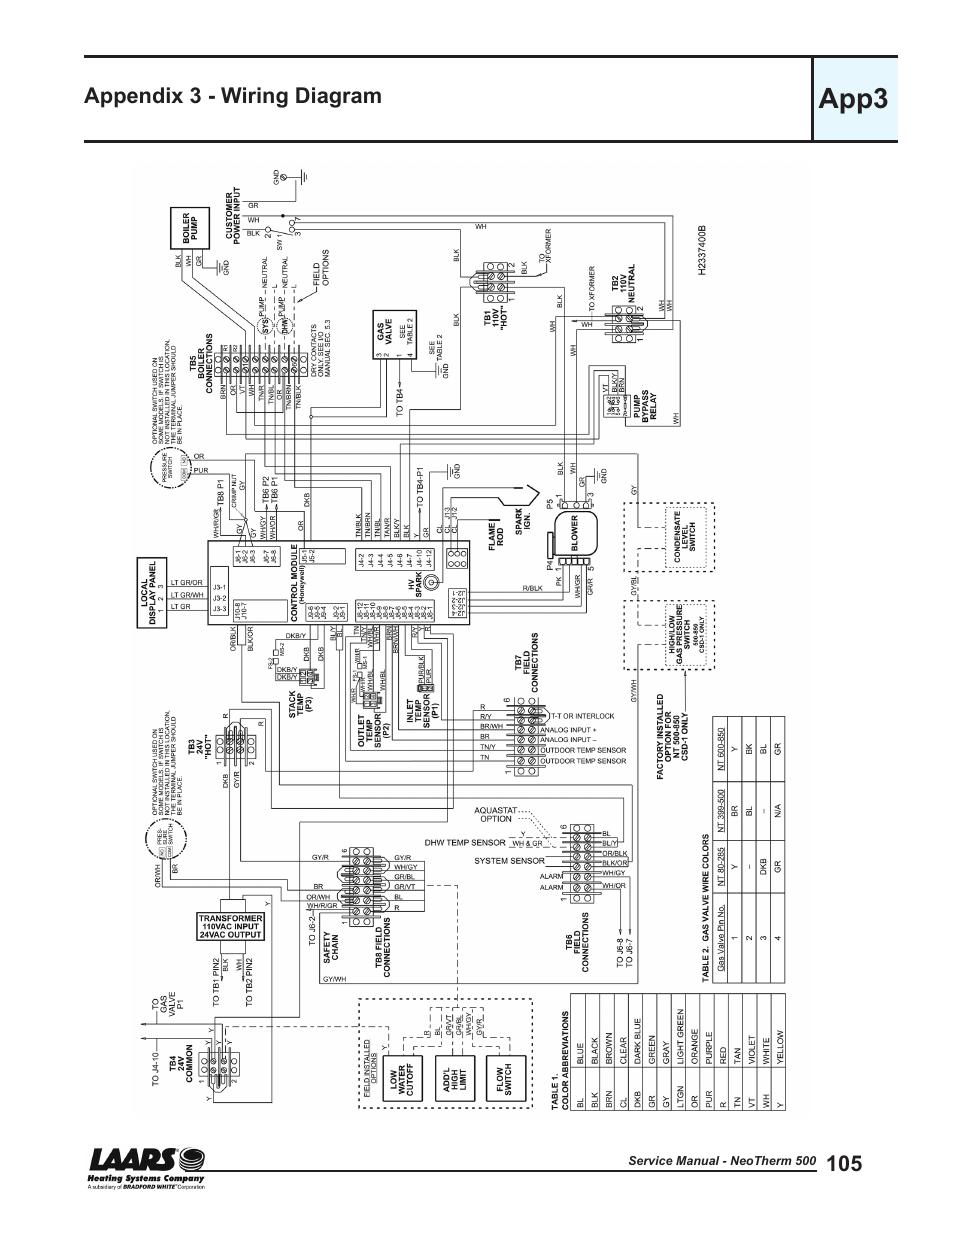 [DIAGRAM] Mazda 3 2012 User Wiring Diagram FULL Version HD